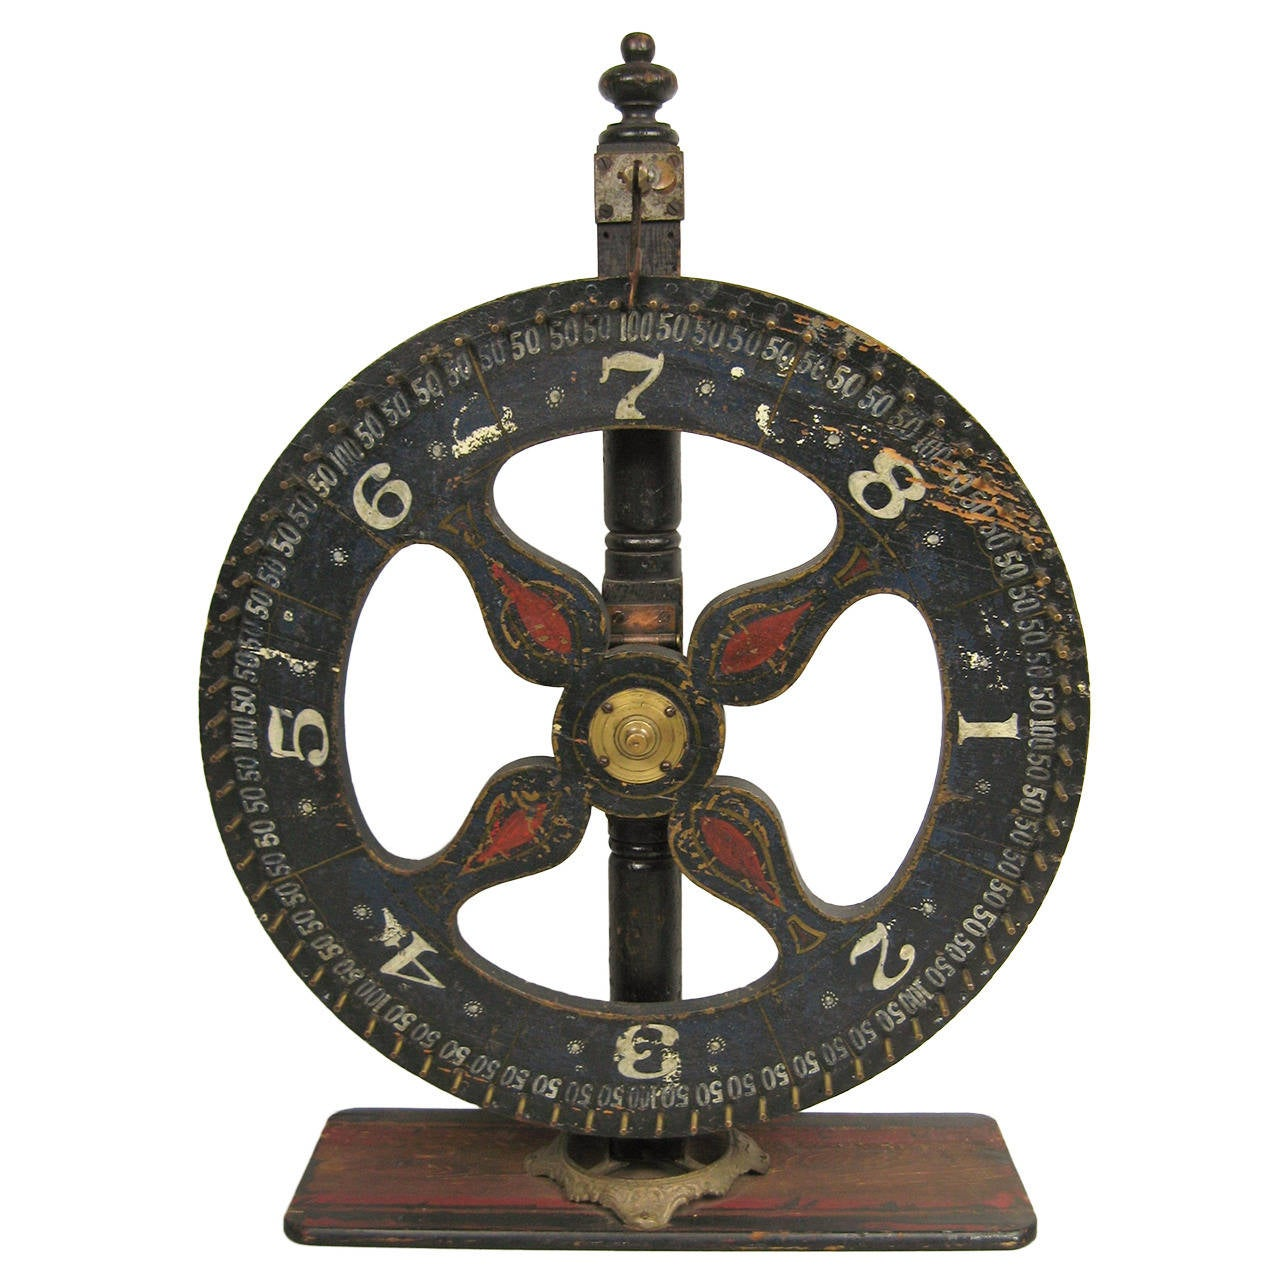 Hand-Painted Early Americana Folk Art Game Wheel